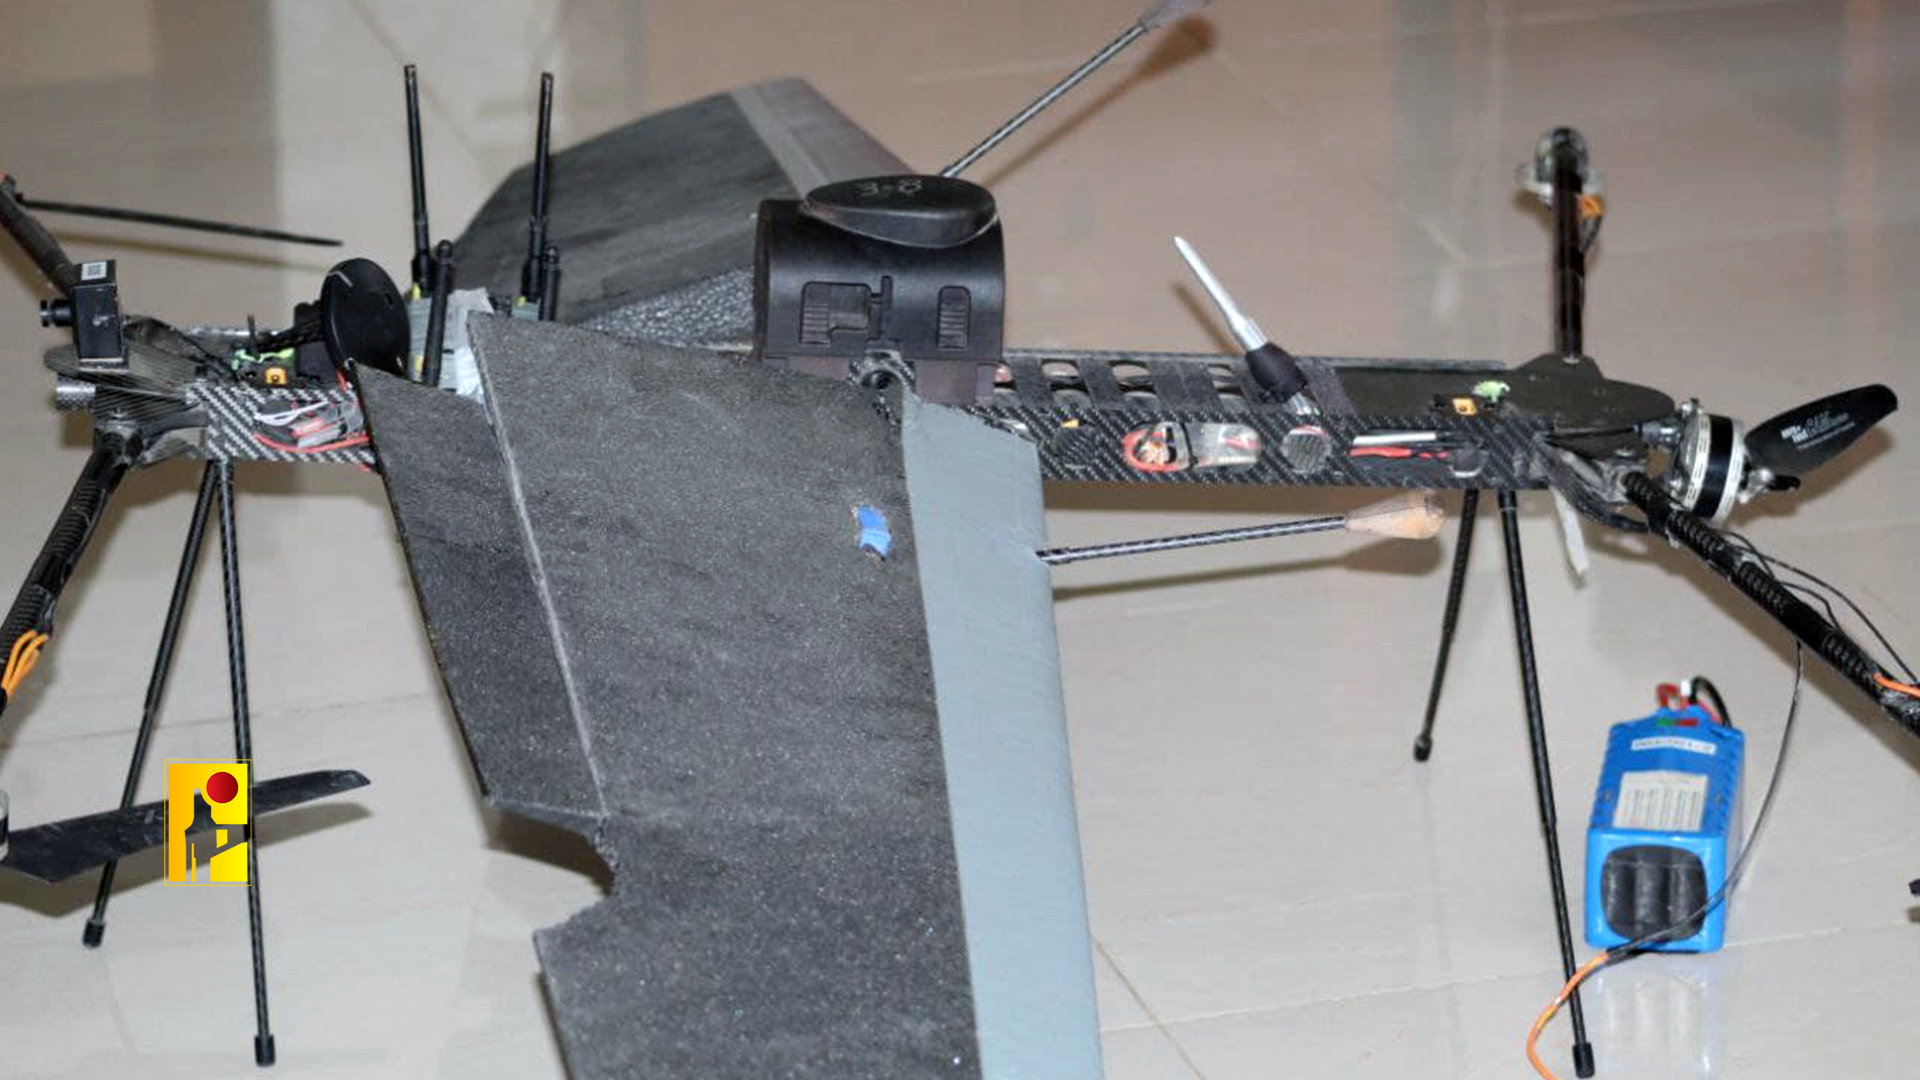 Hezbollah Shot Down Never-Seen-Before Israeli Drone Over South Lebanon (Photos)